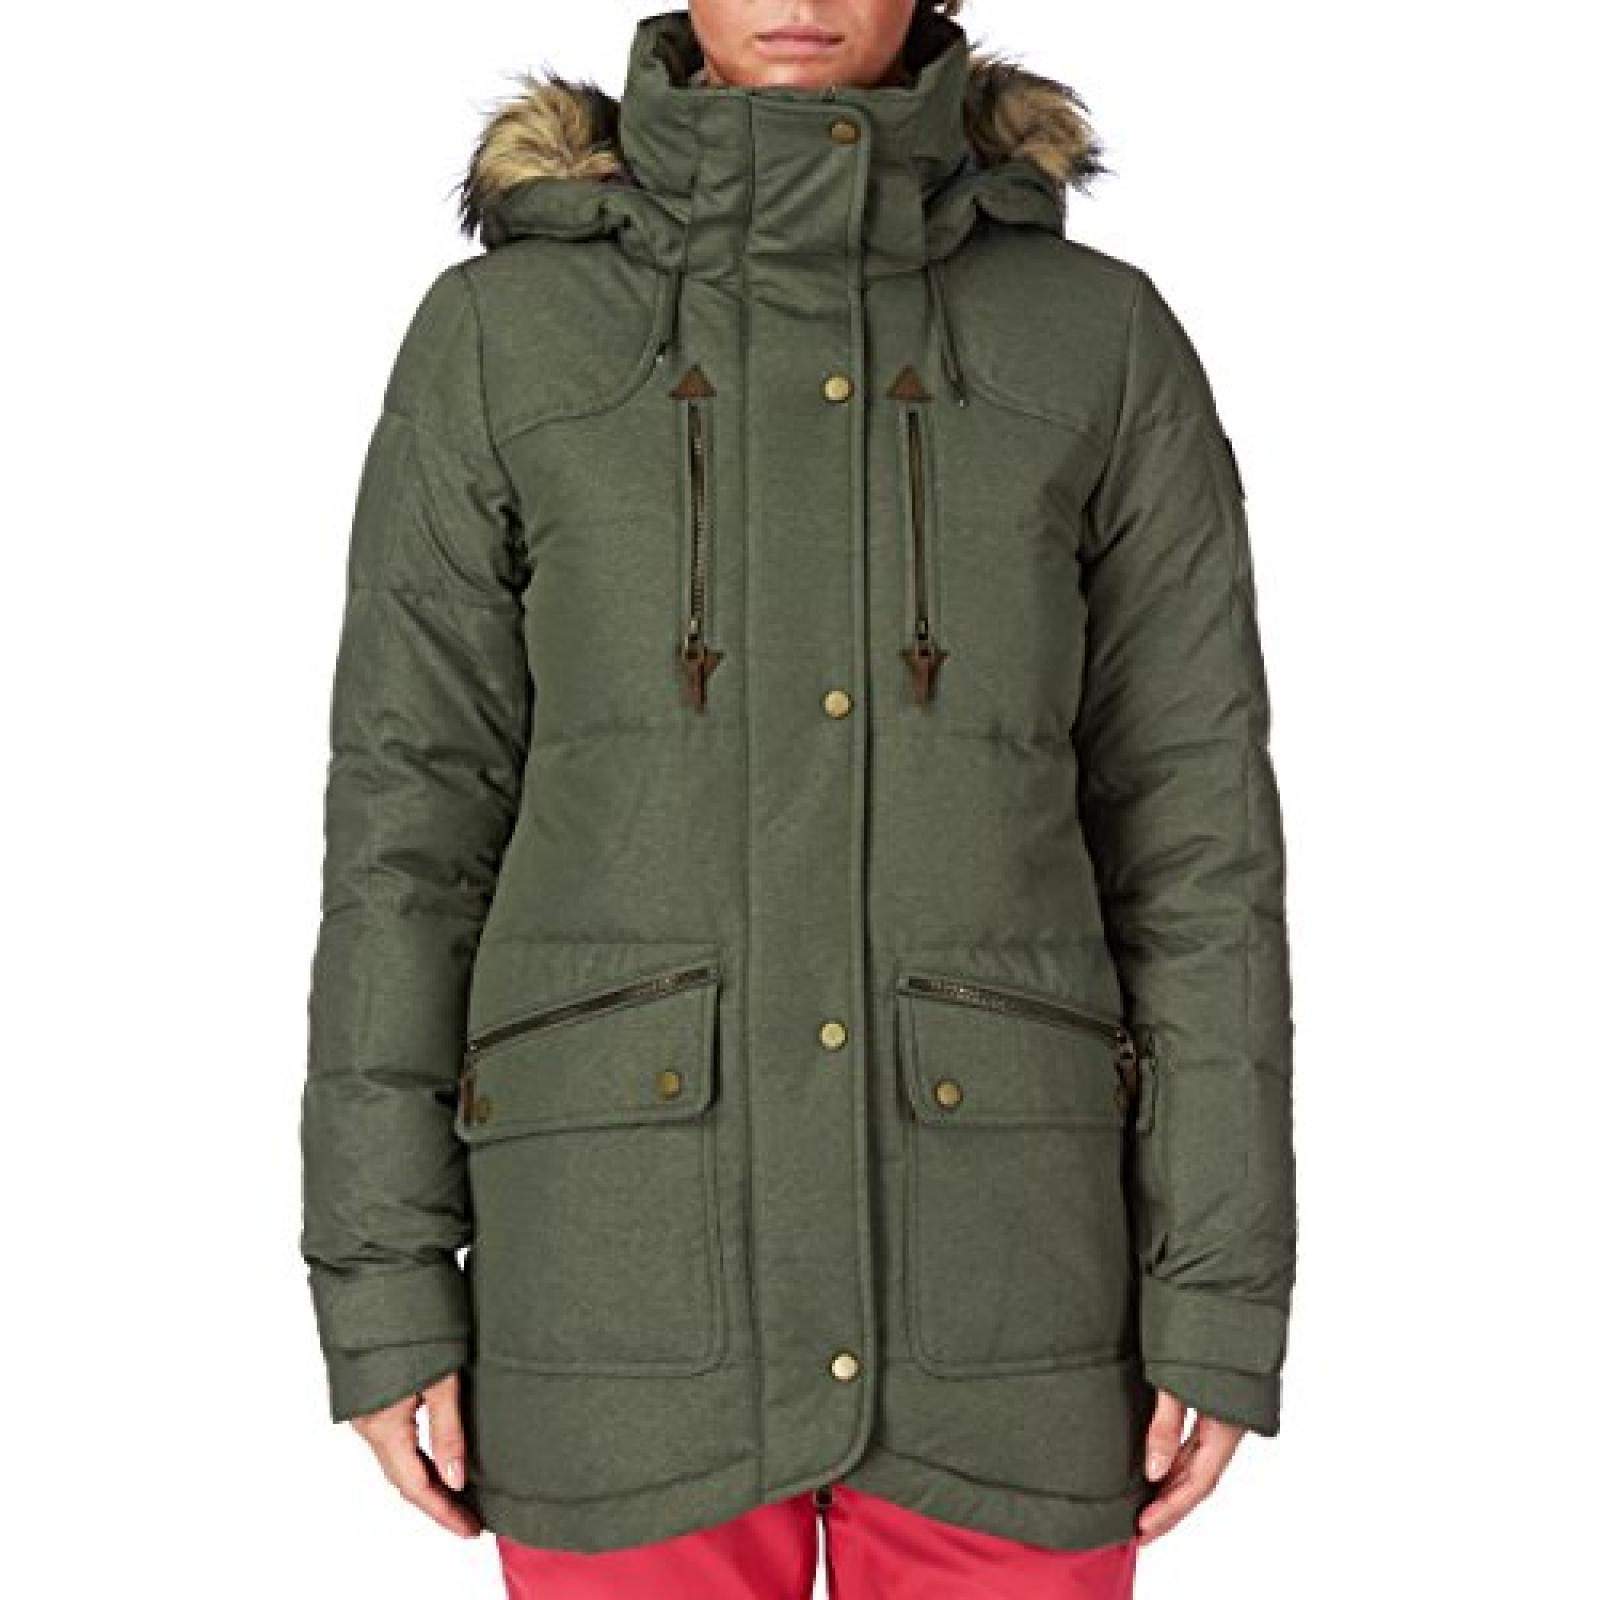 Rip Curl Liberty Parka Jkt Snow Jacket - Dusty Olive